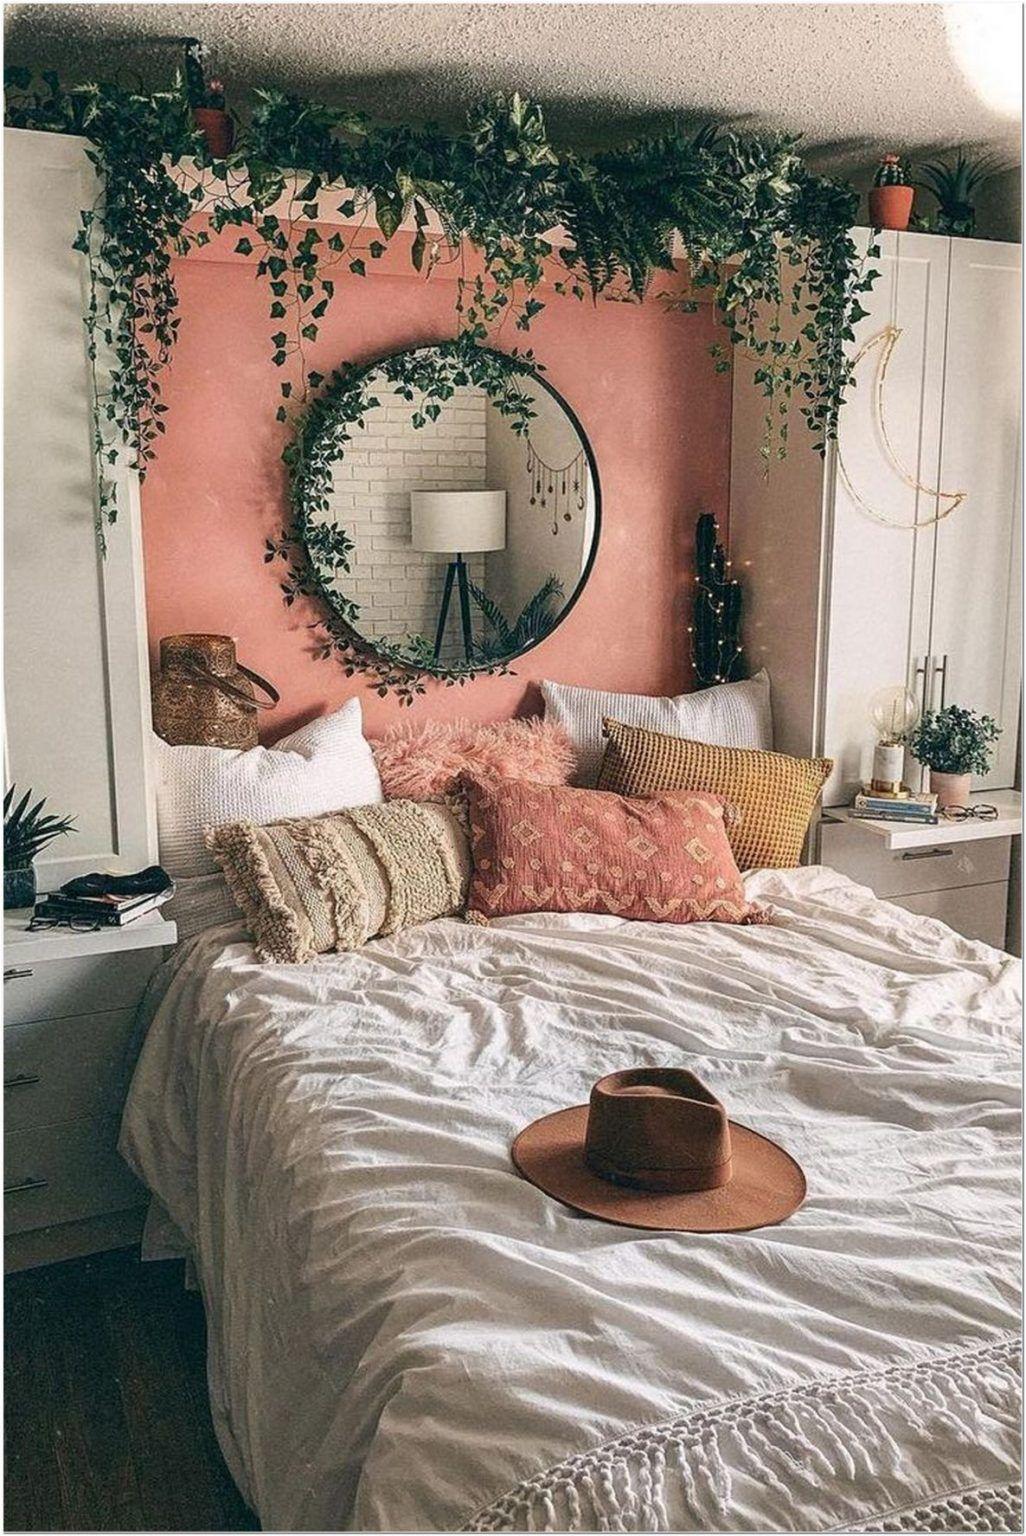 78 Modern Bohemian Bedroom Decor Ideas 8 In 2020 Cool Dorm Rooms Aesthetic Bedroom Room Inspo